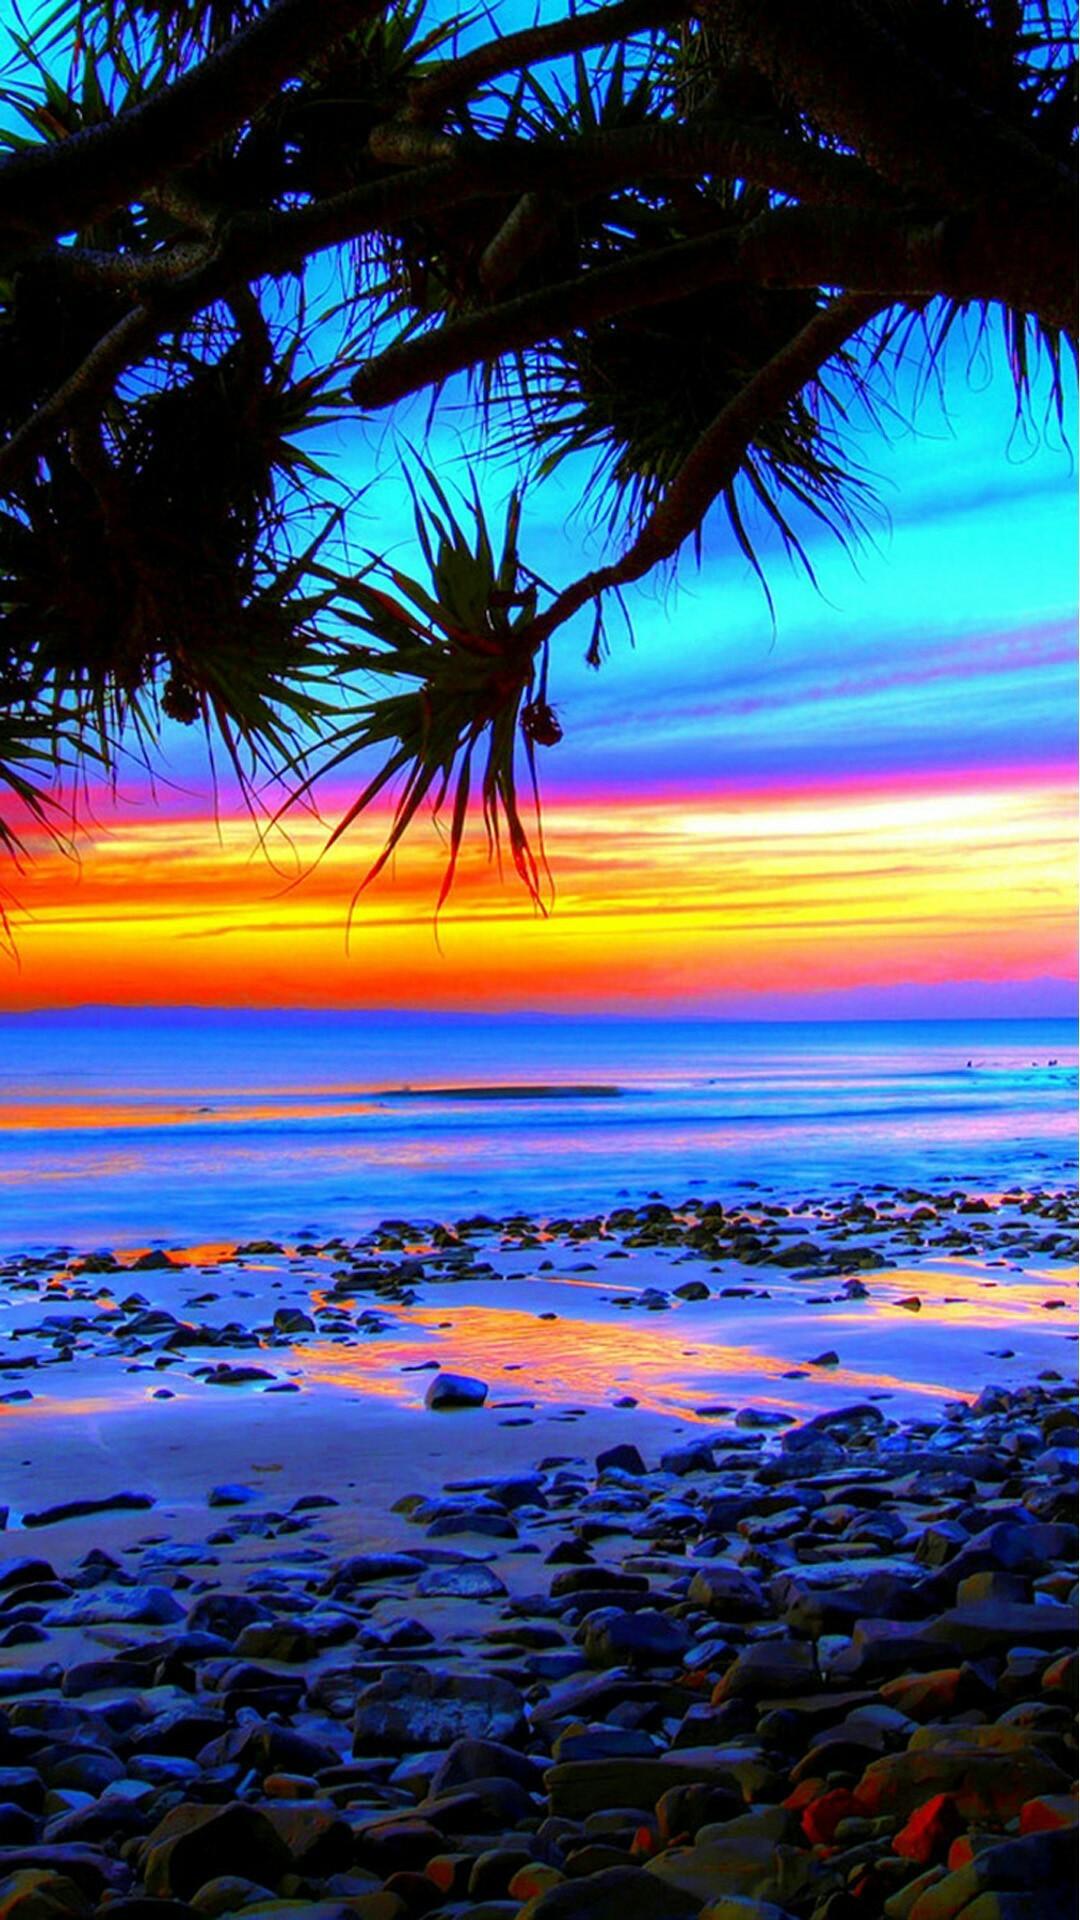 Blue orange purple sunset